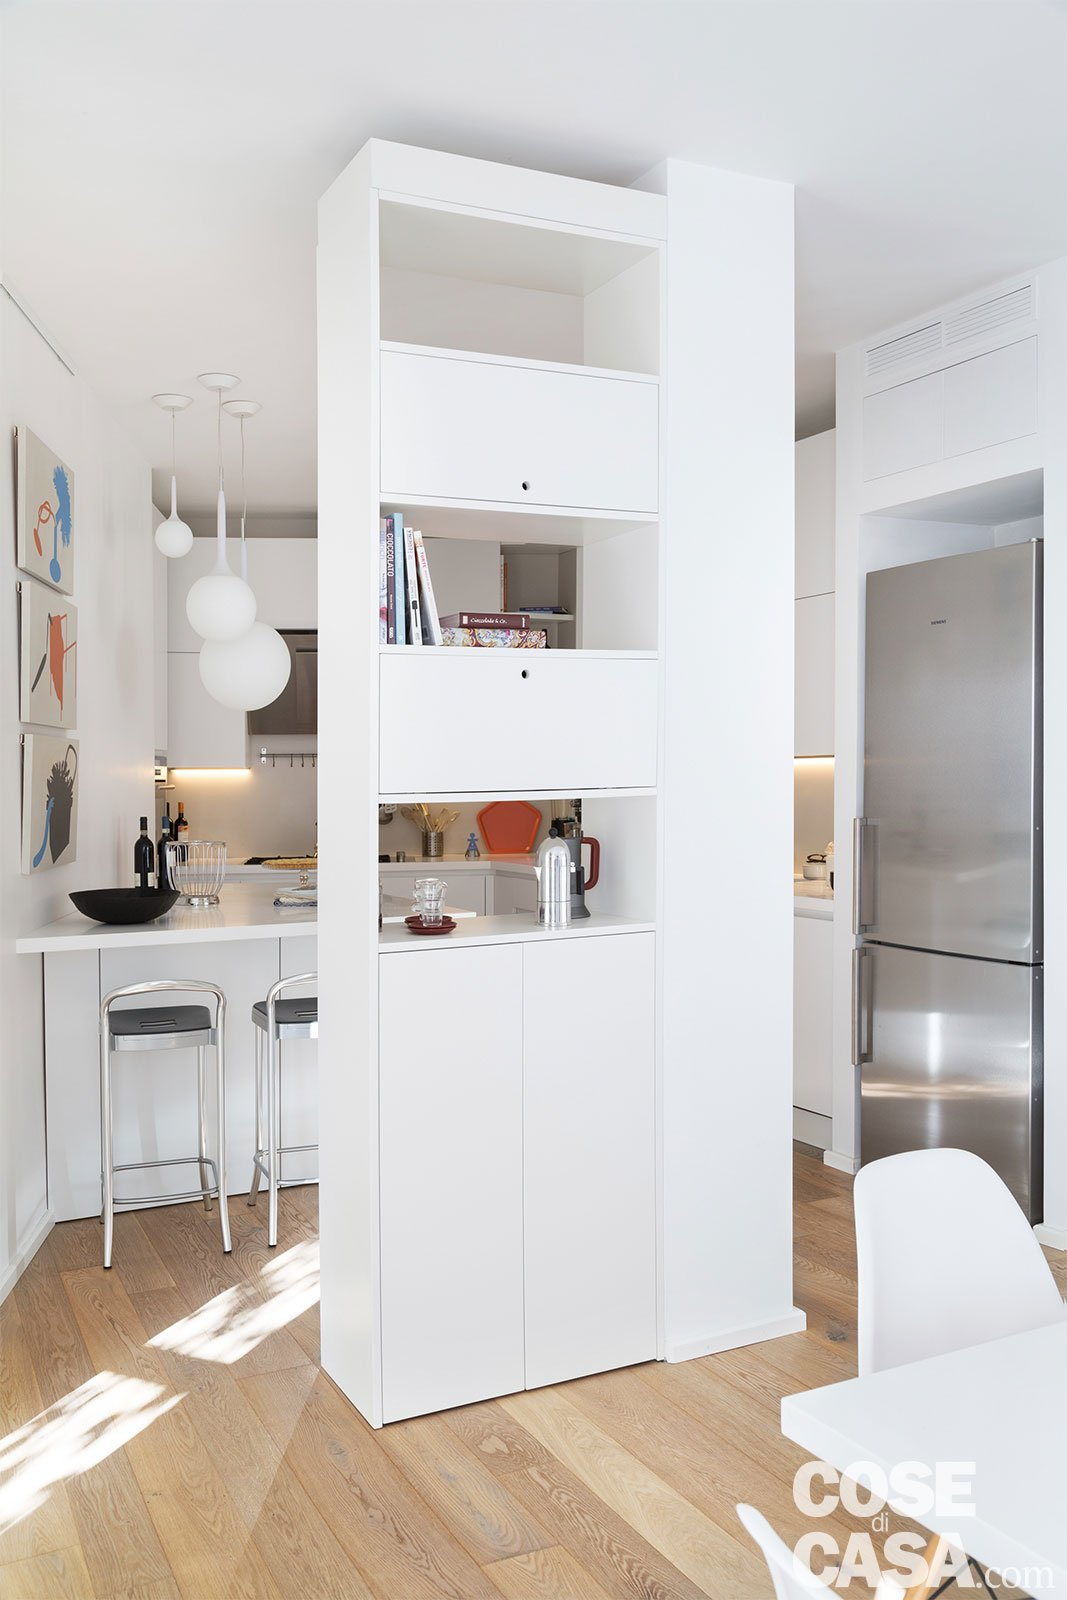 130 mq casa studio con soluzioni a scomparsa cose di casa - Soluzioni cucina ...